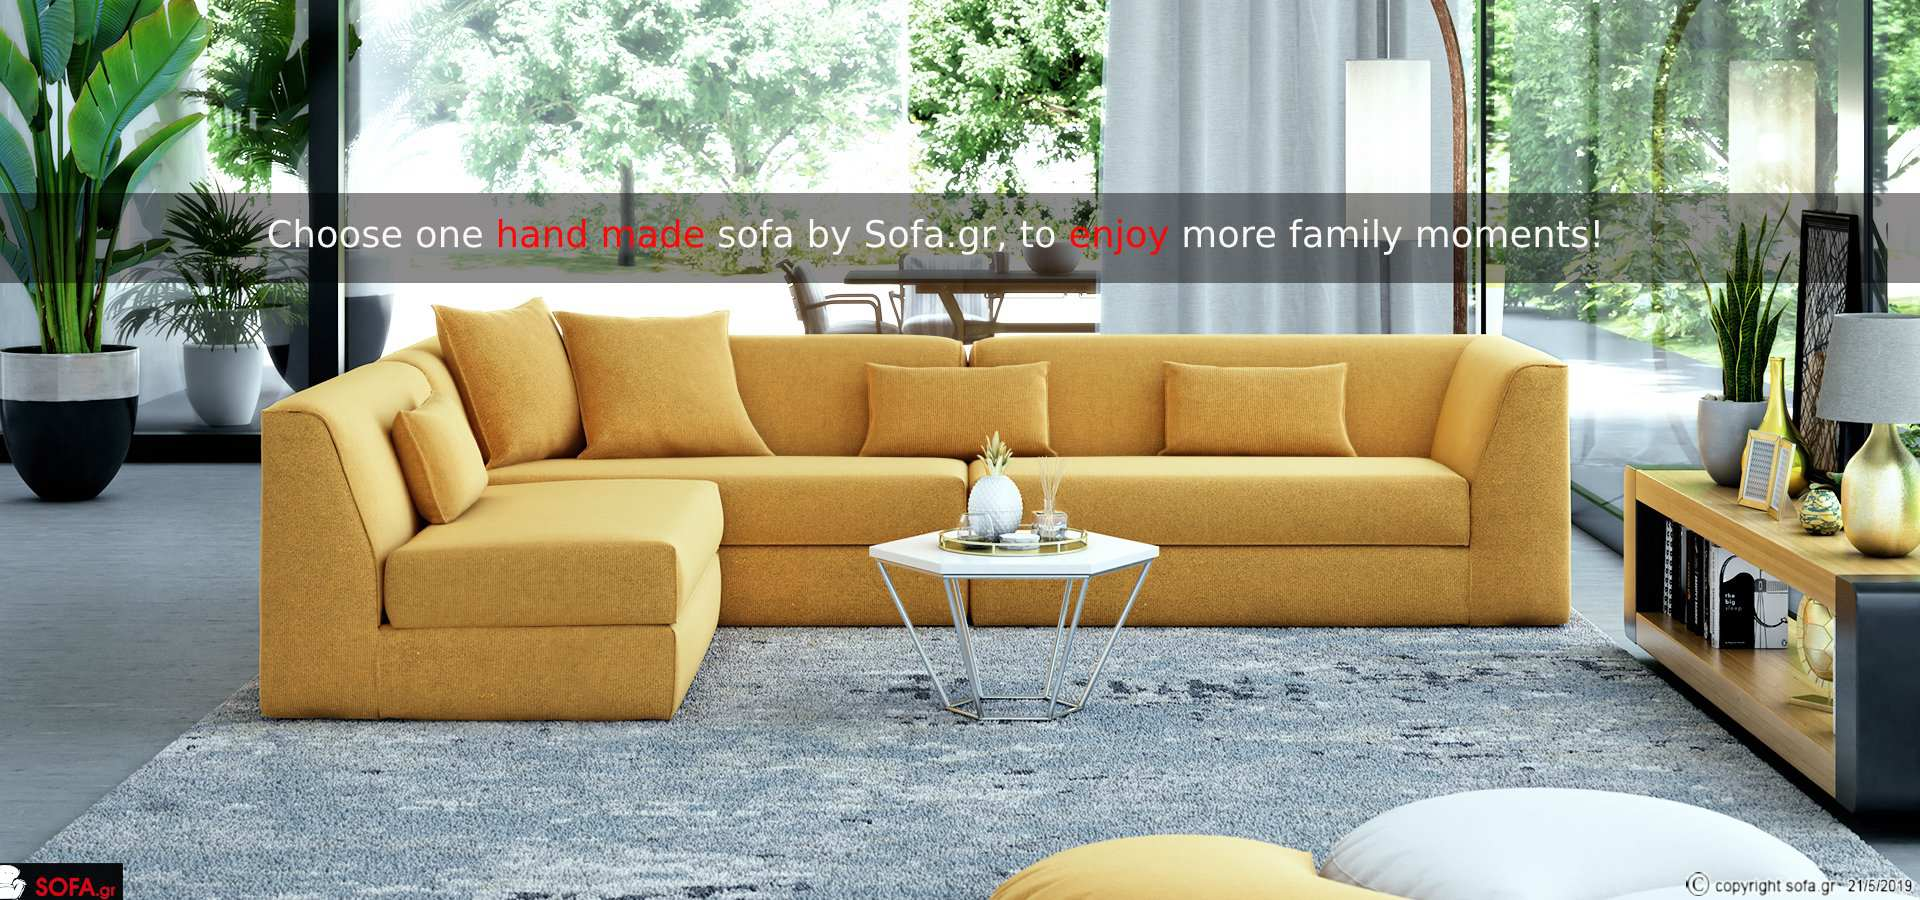 Sofas by Sofa.gr